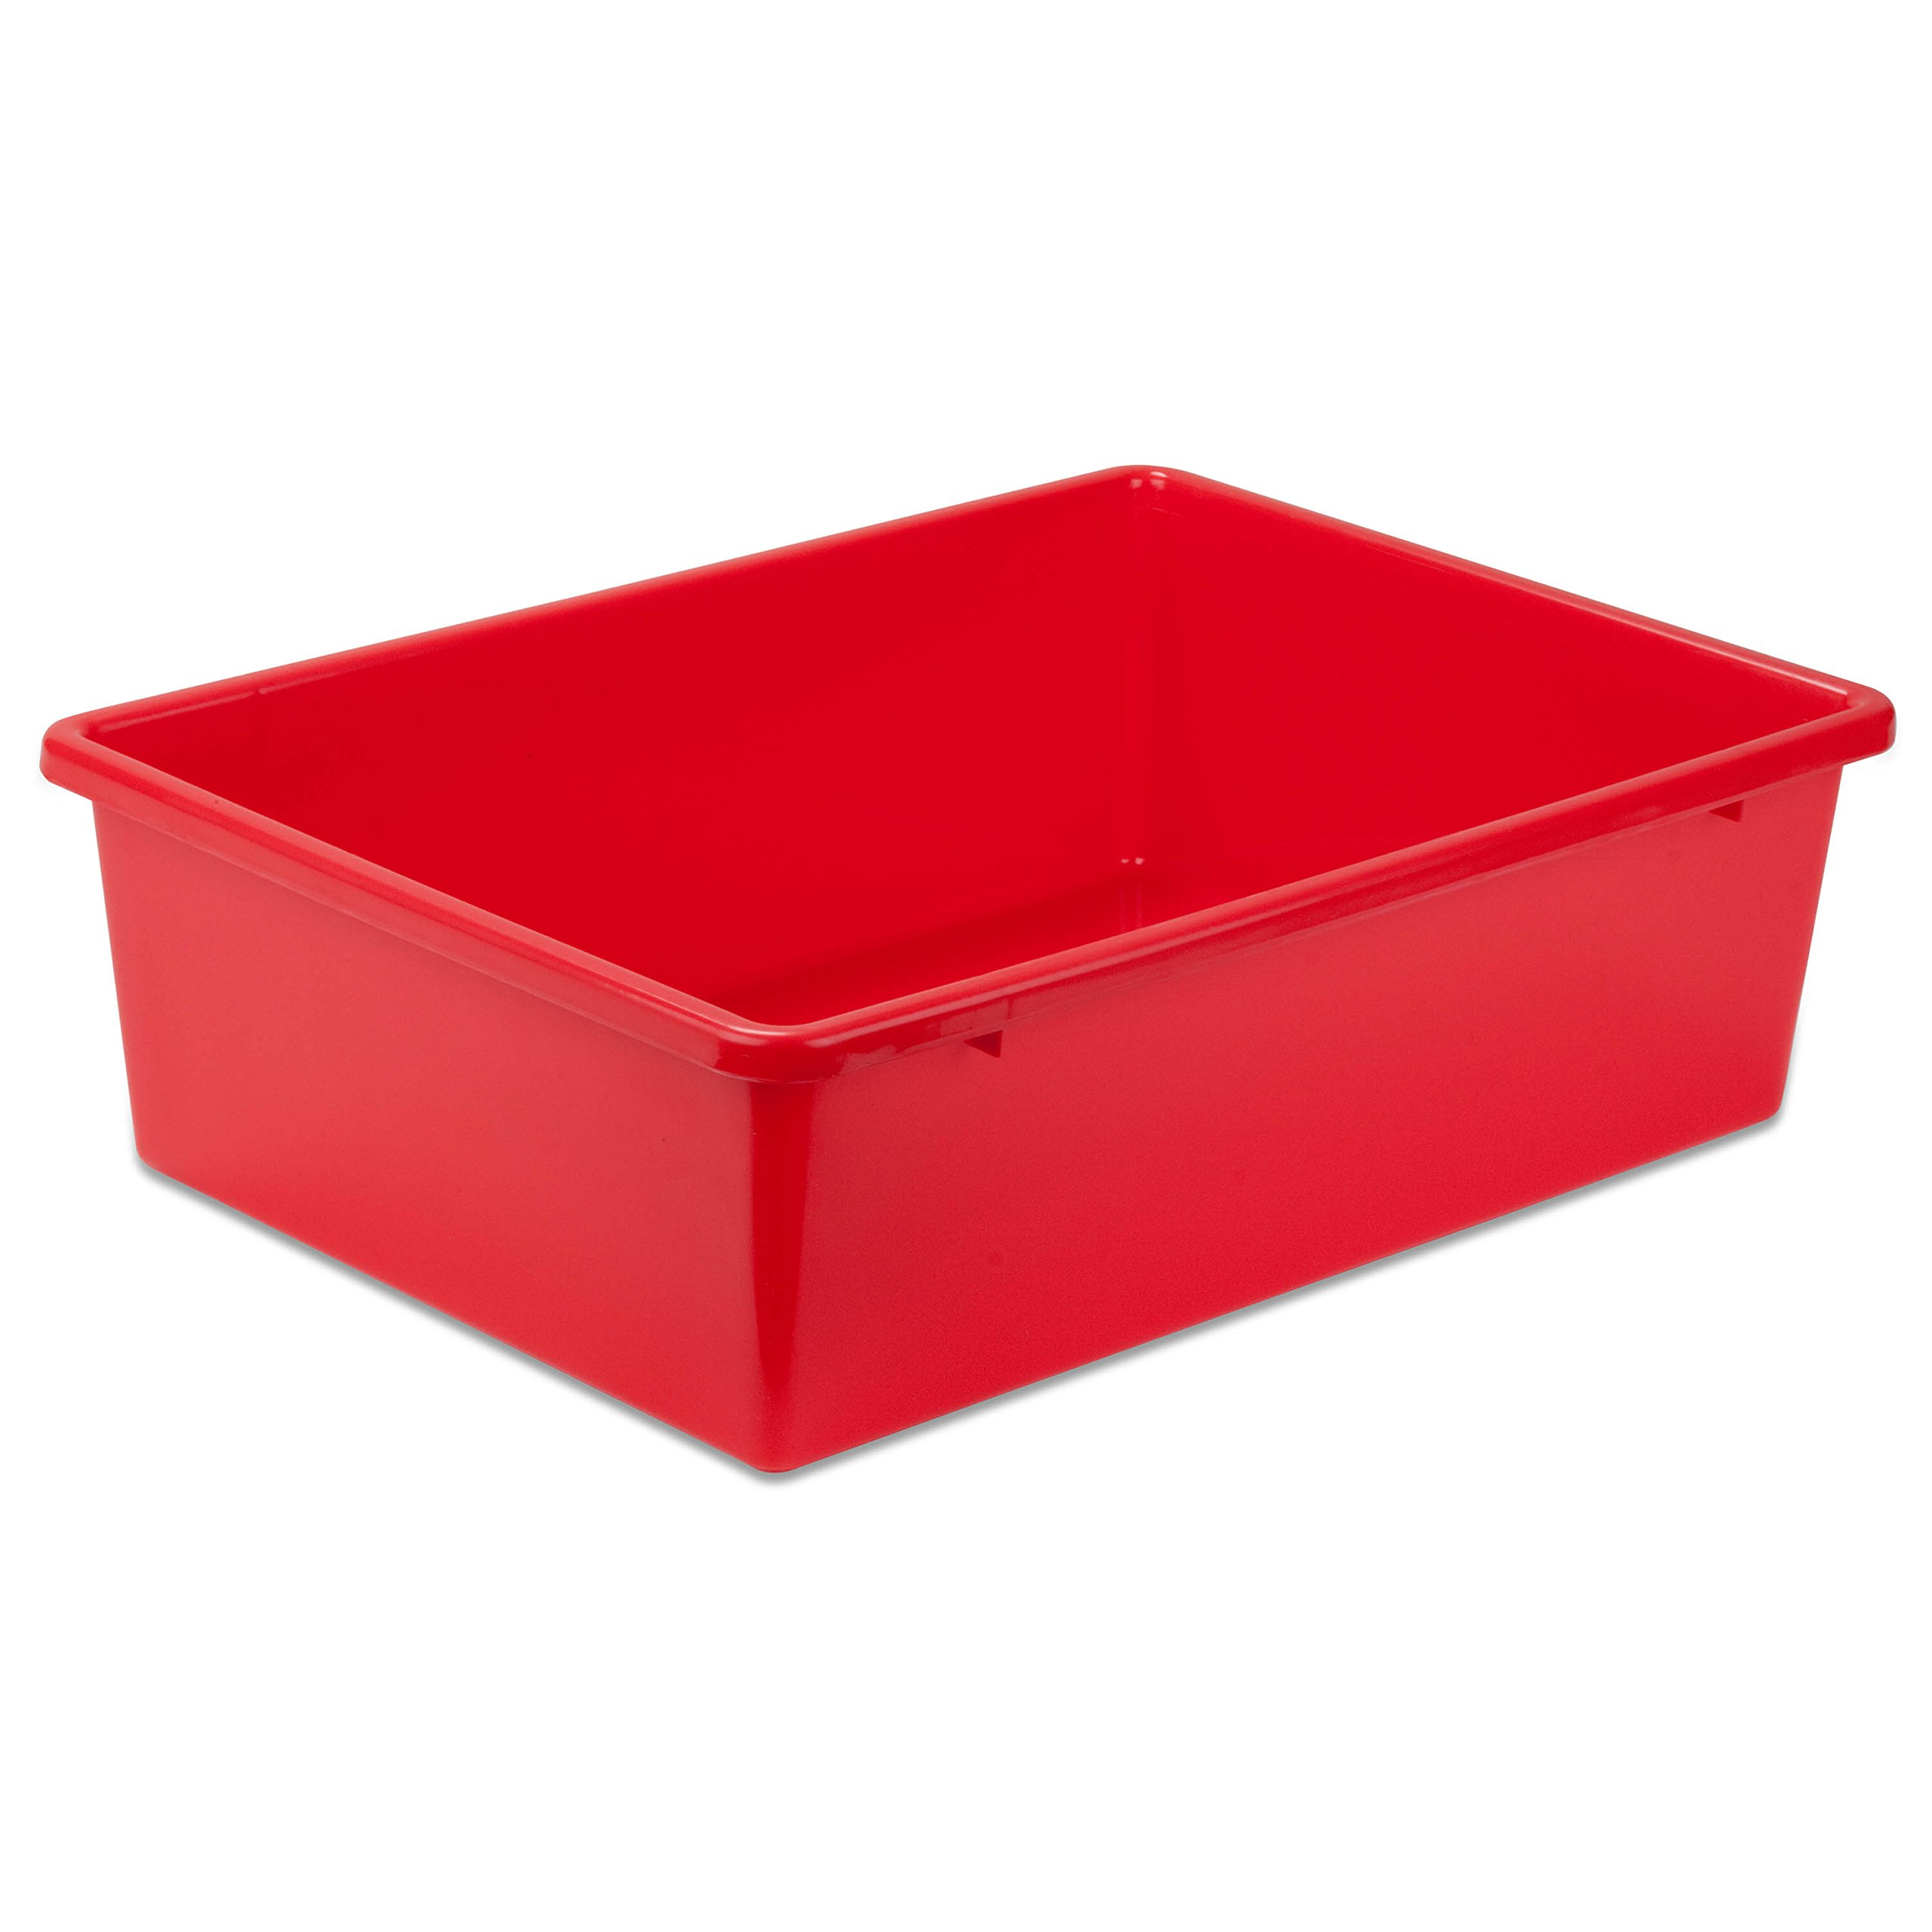 Honey-Can-Do PRT-SRT1602-Lgred large plastic bin, red by Honey-Can-Do